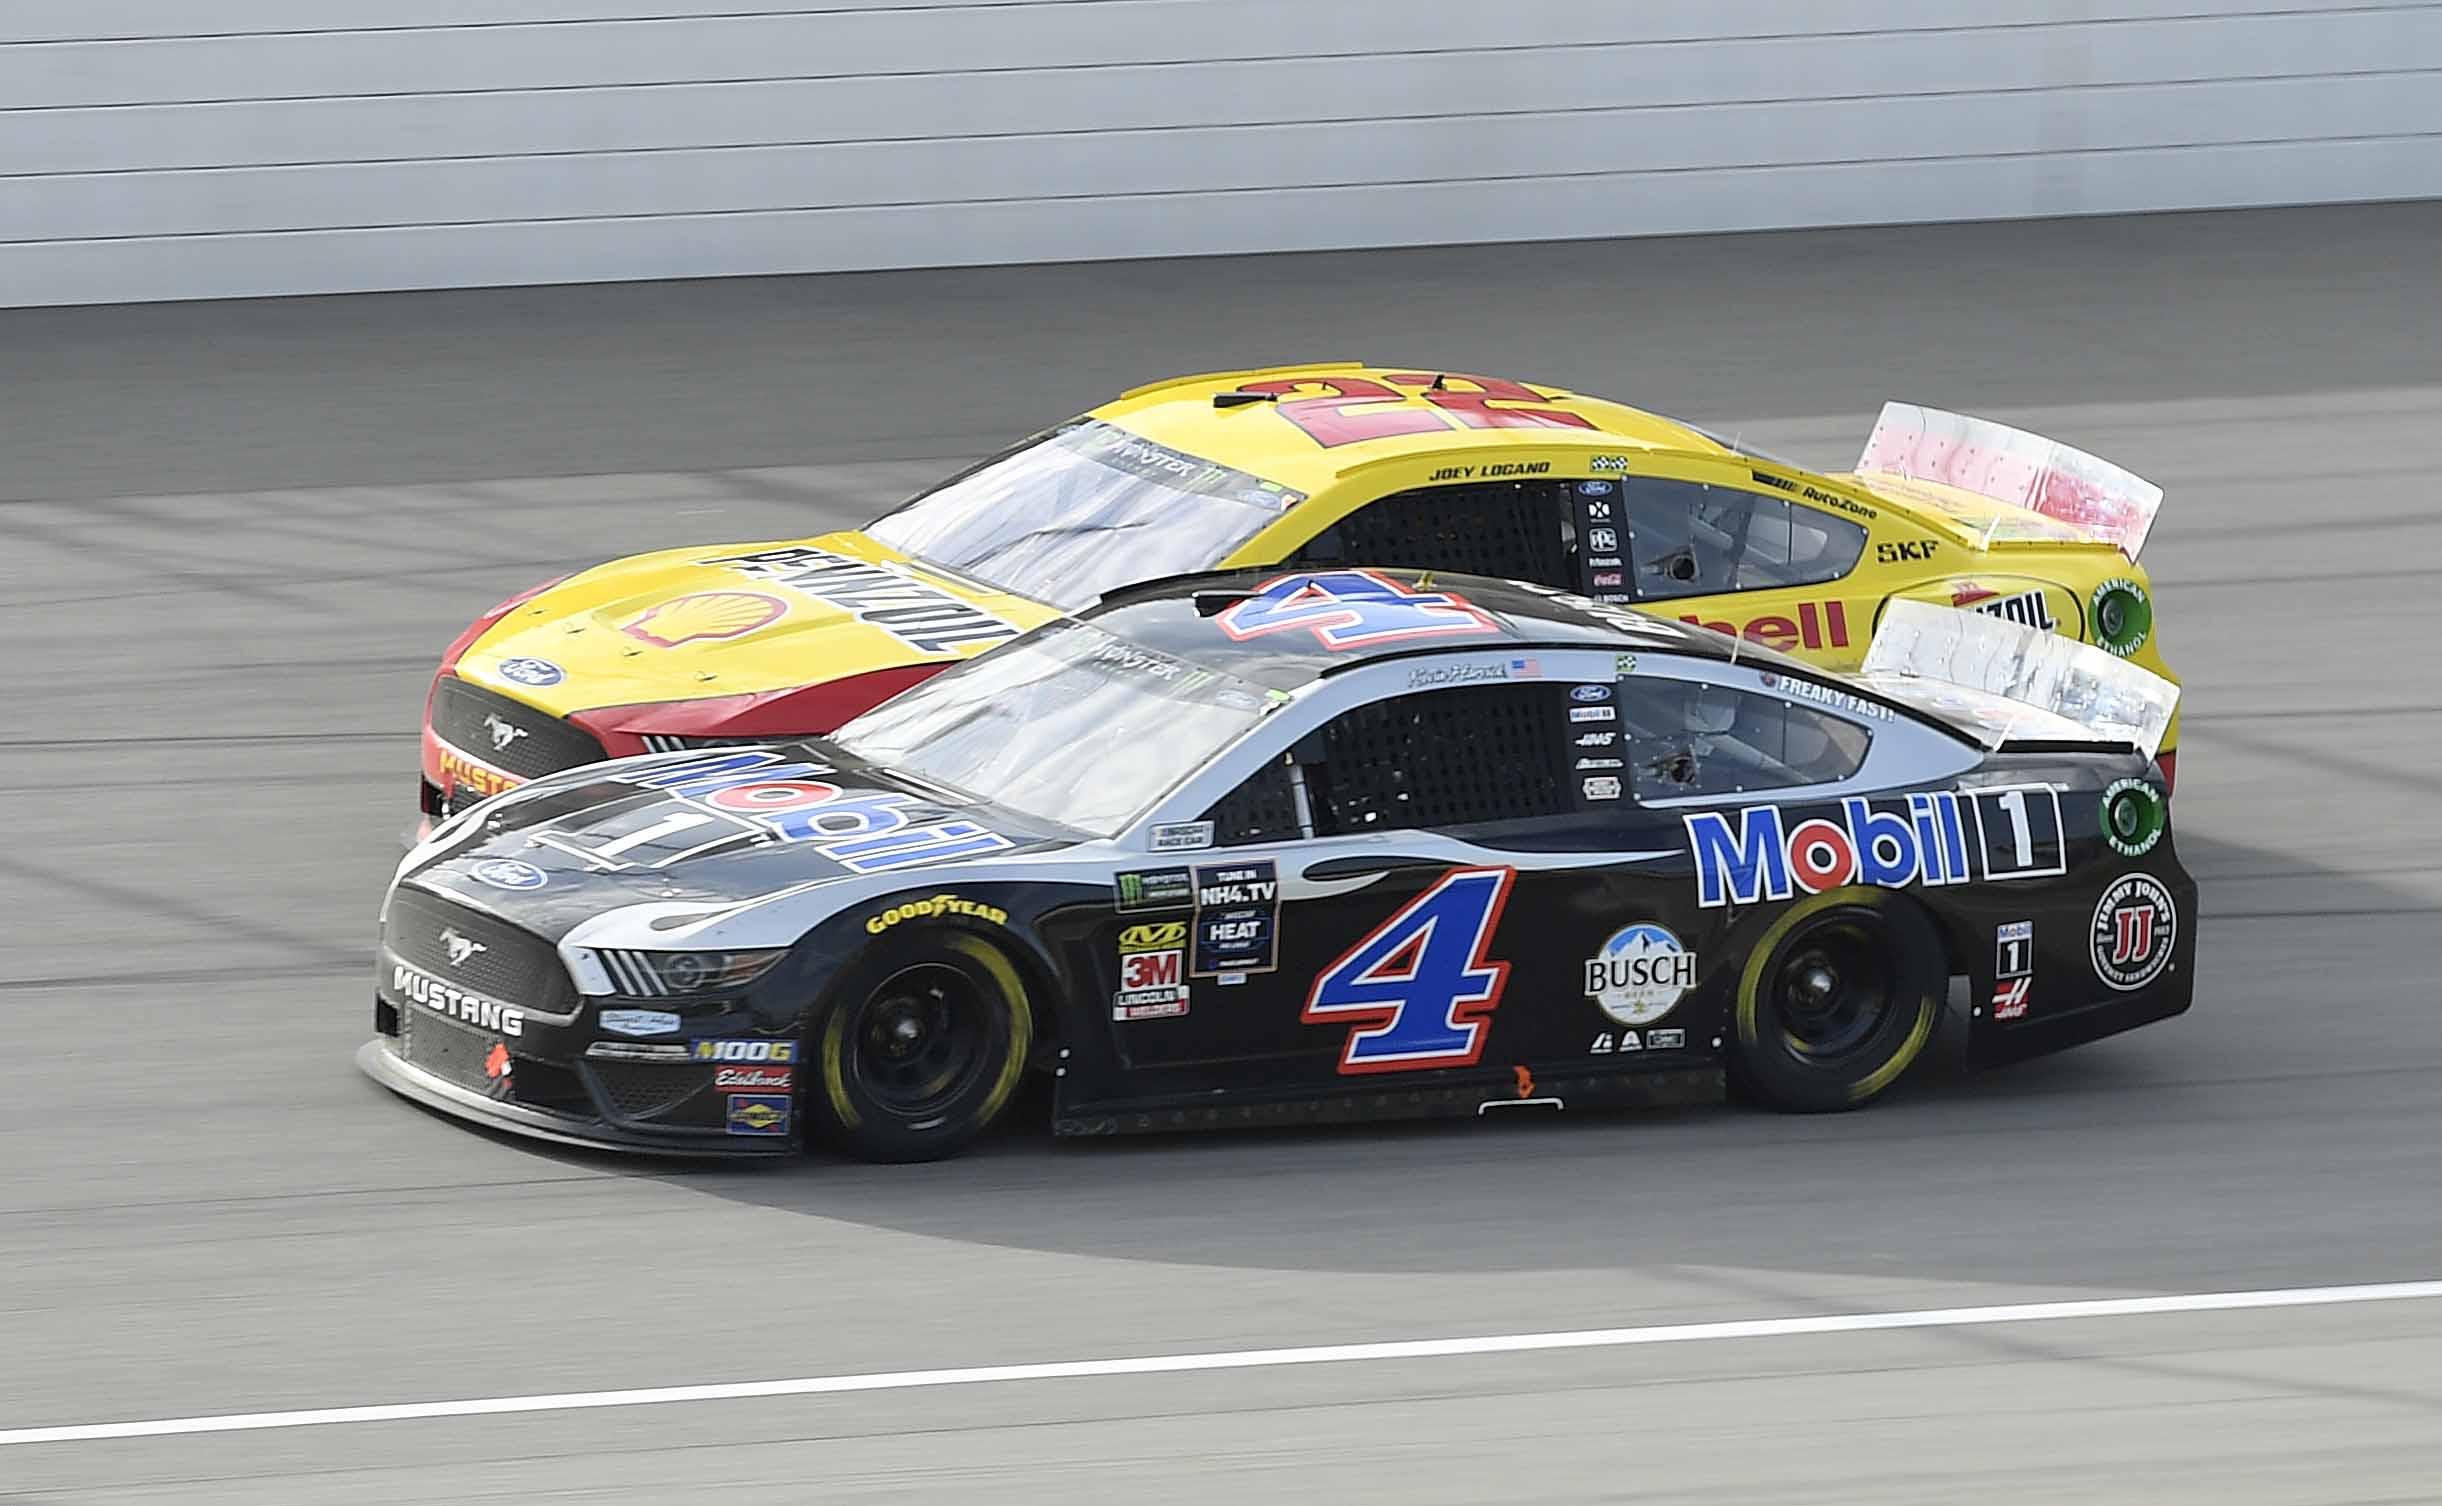 Joey Logano and Kevin Harvick at Michigan International Speedway - NASCAR Cup Series